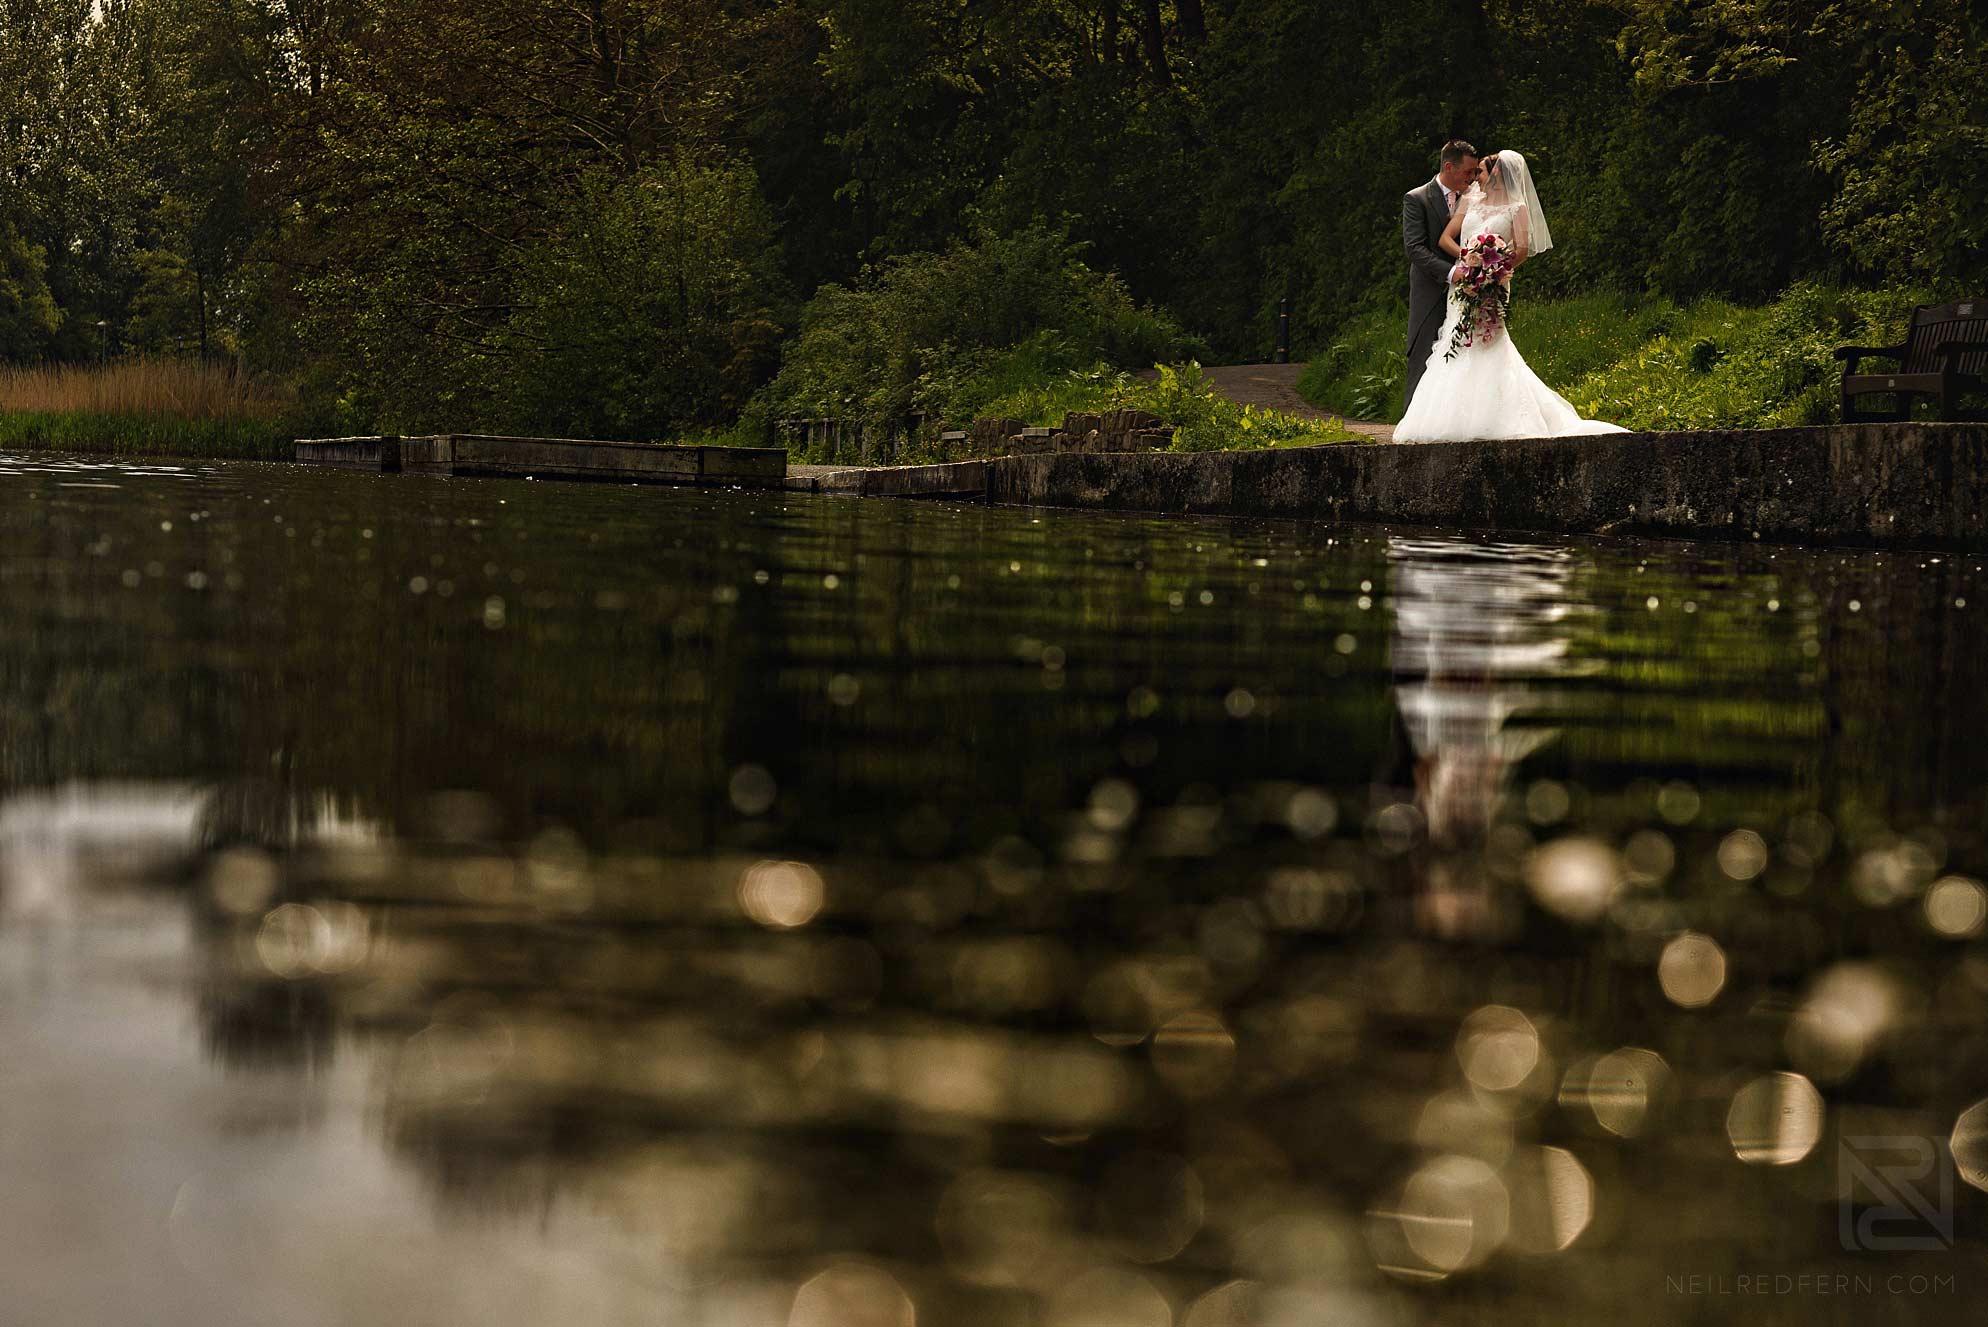 Metropole-Hotel-Llandrindod-Wells-wedding-21